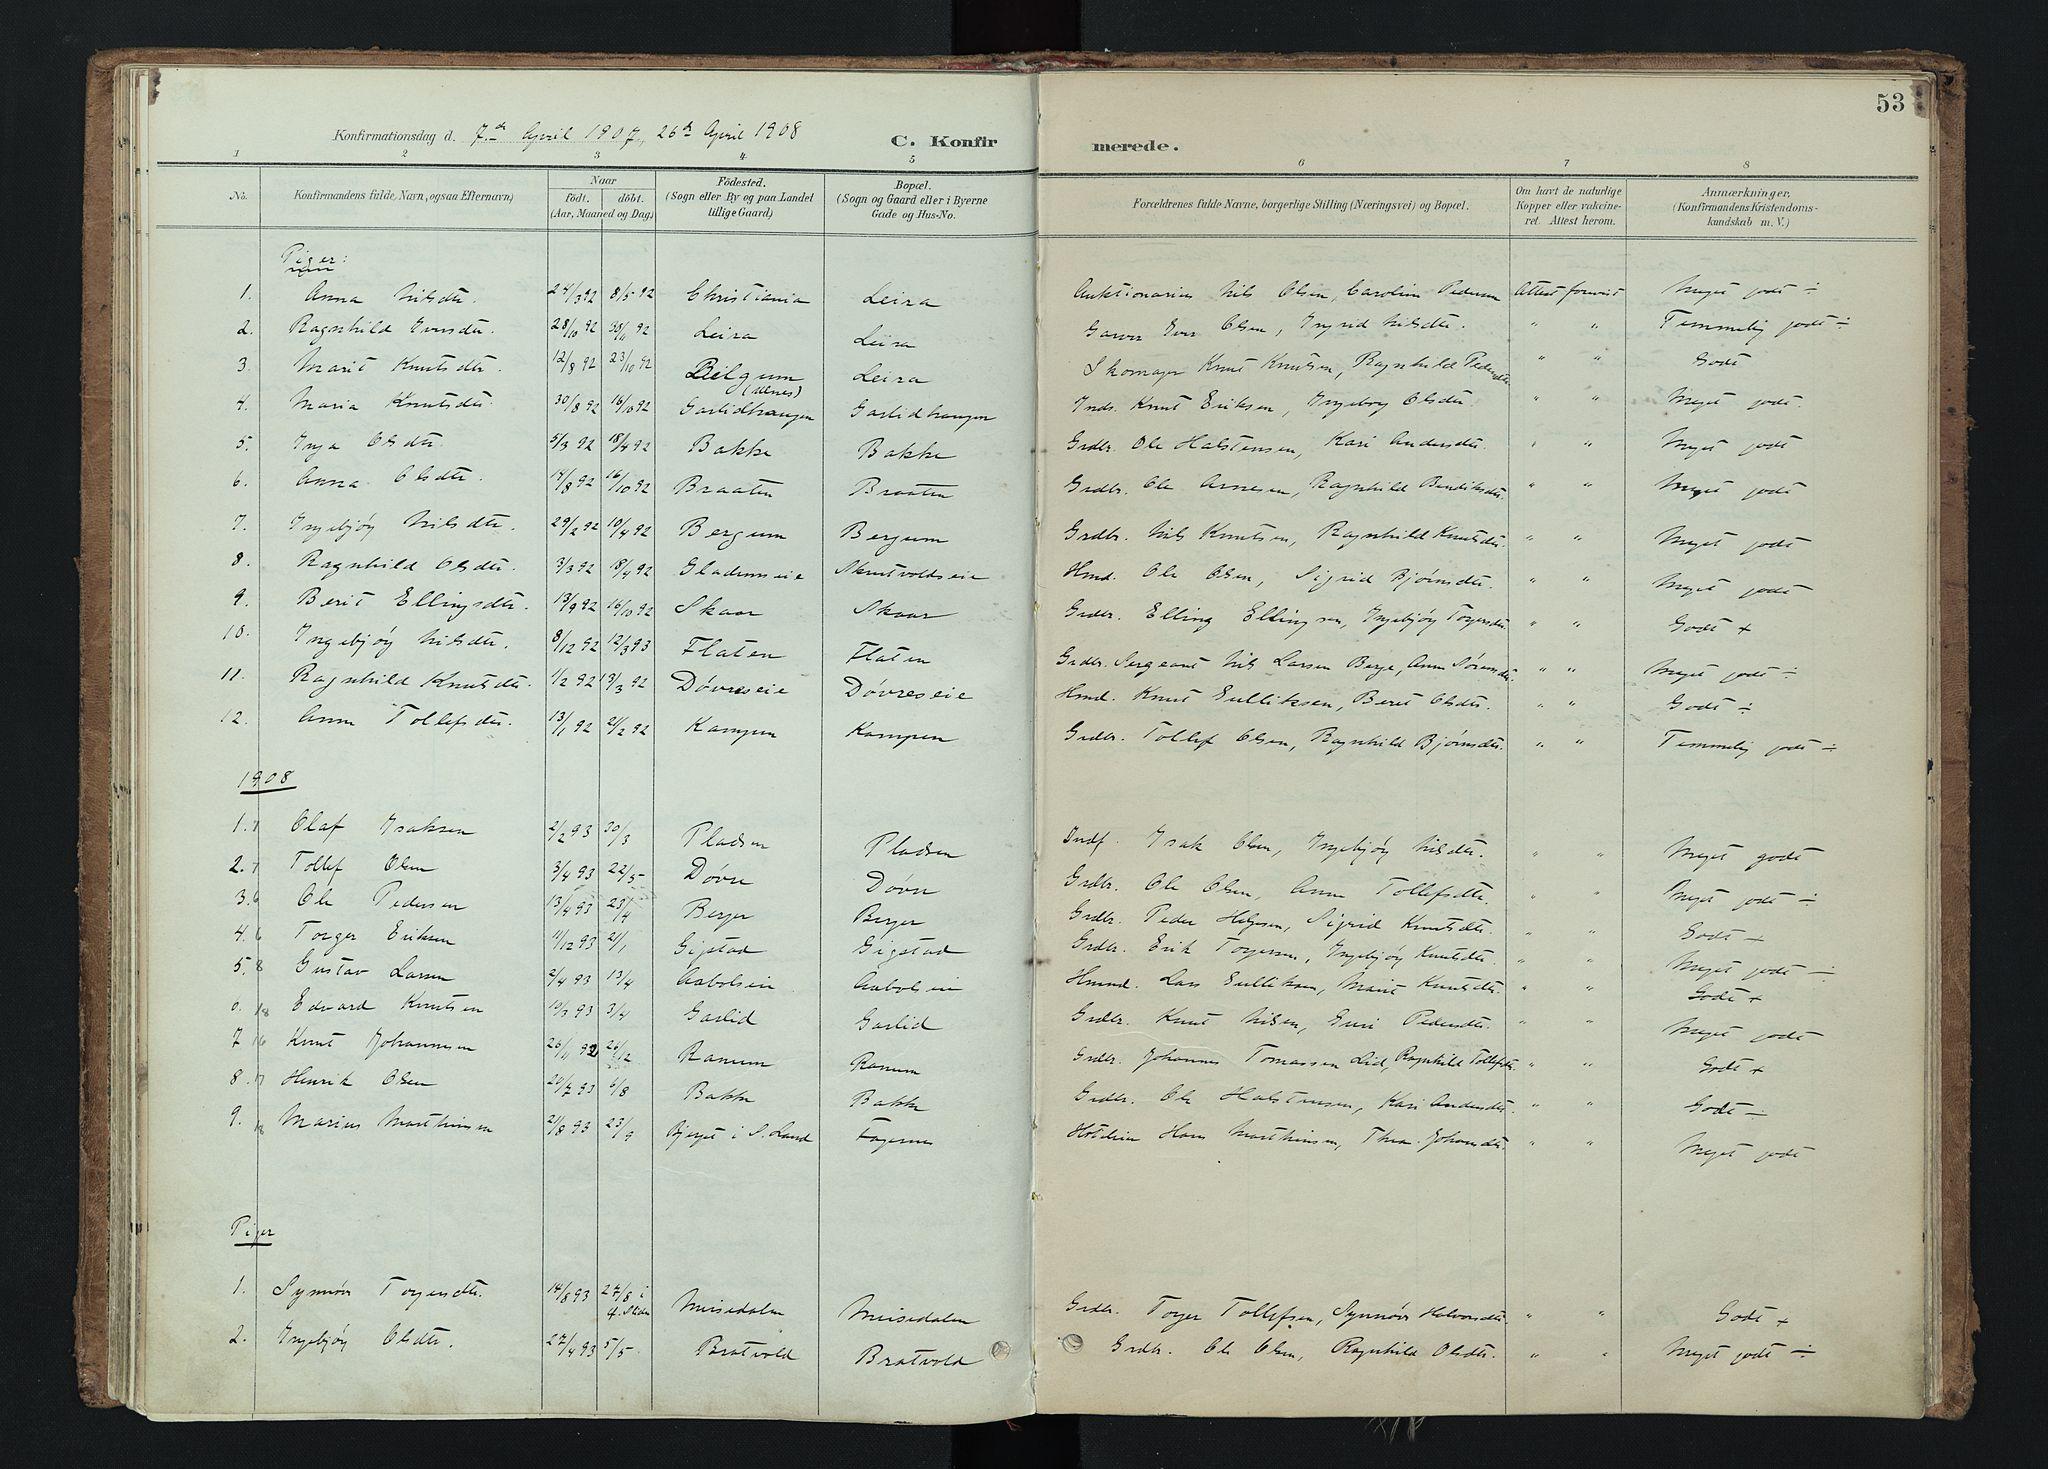 SAH, Nord-Aurdal prestekontor, Ministerialbok nr. 15, 1896-1914, s. 53